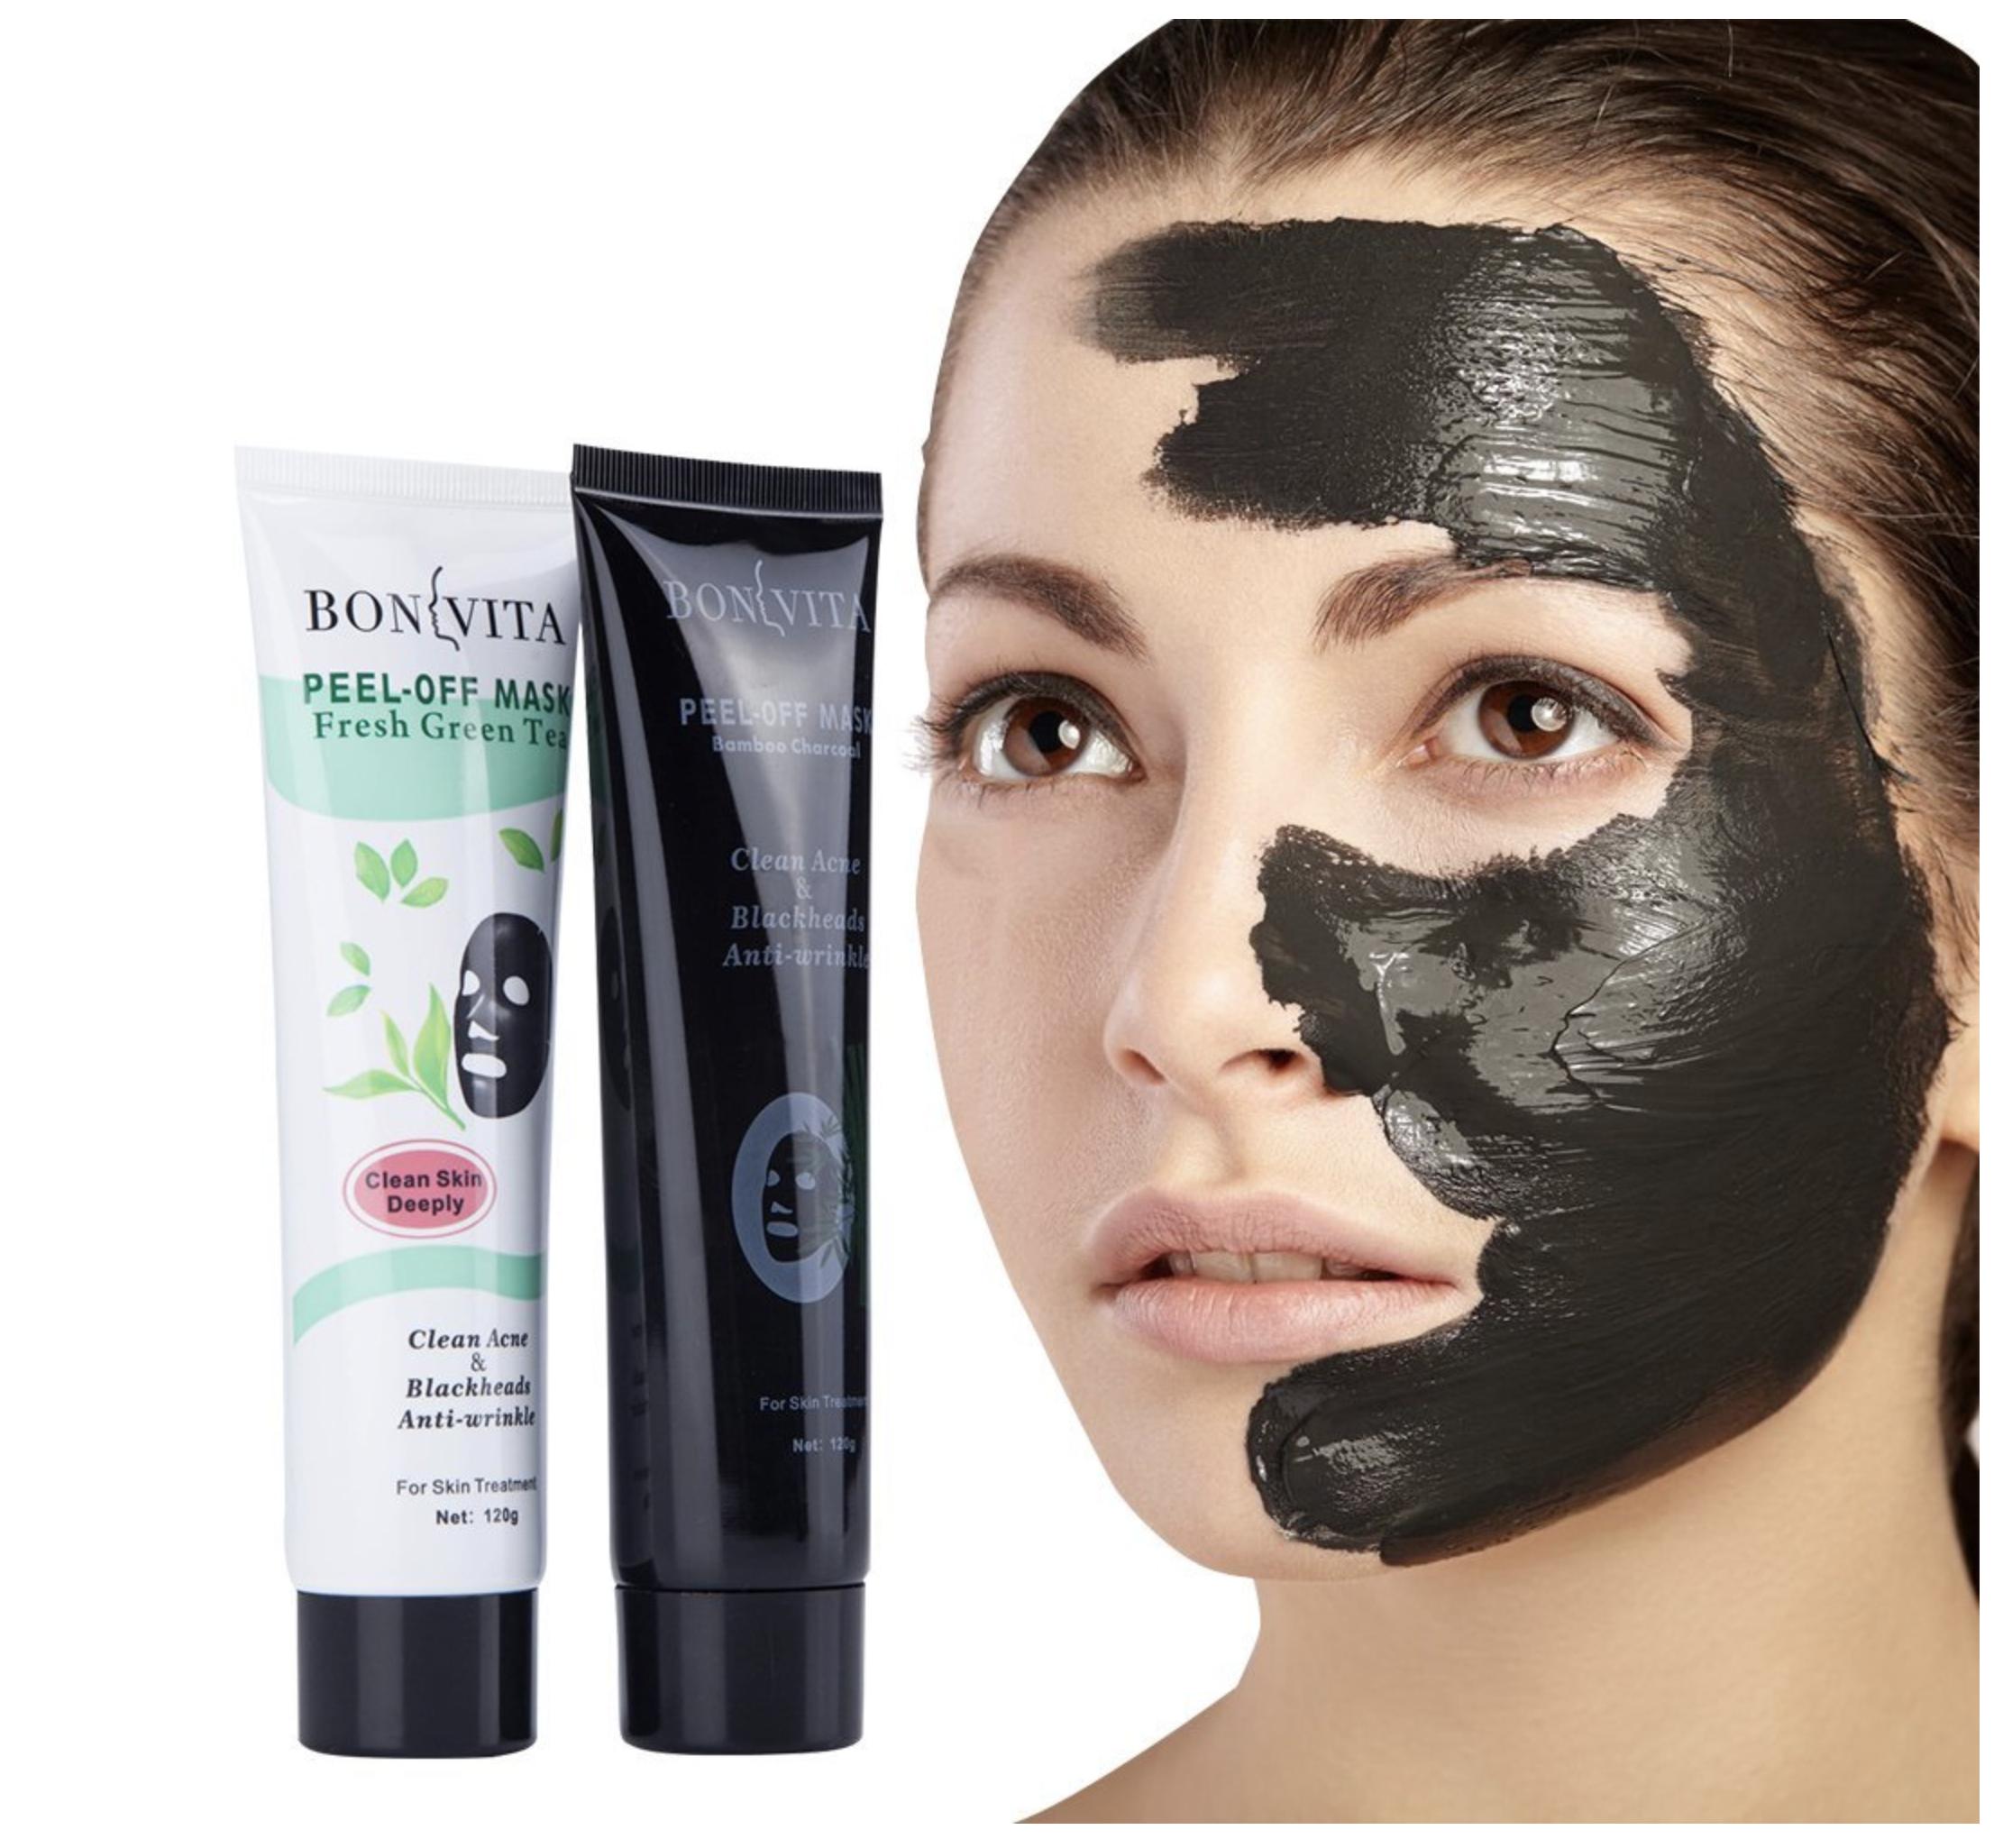 Best 25 Bamboo Charcoal Mask Ideas On Pinterest: * Amazing Reviews * BONVITA